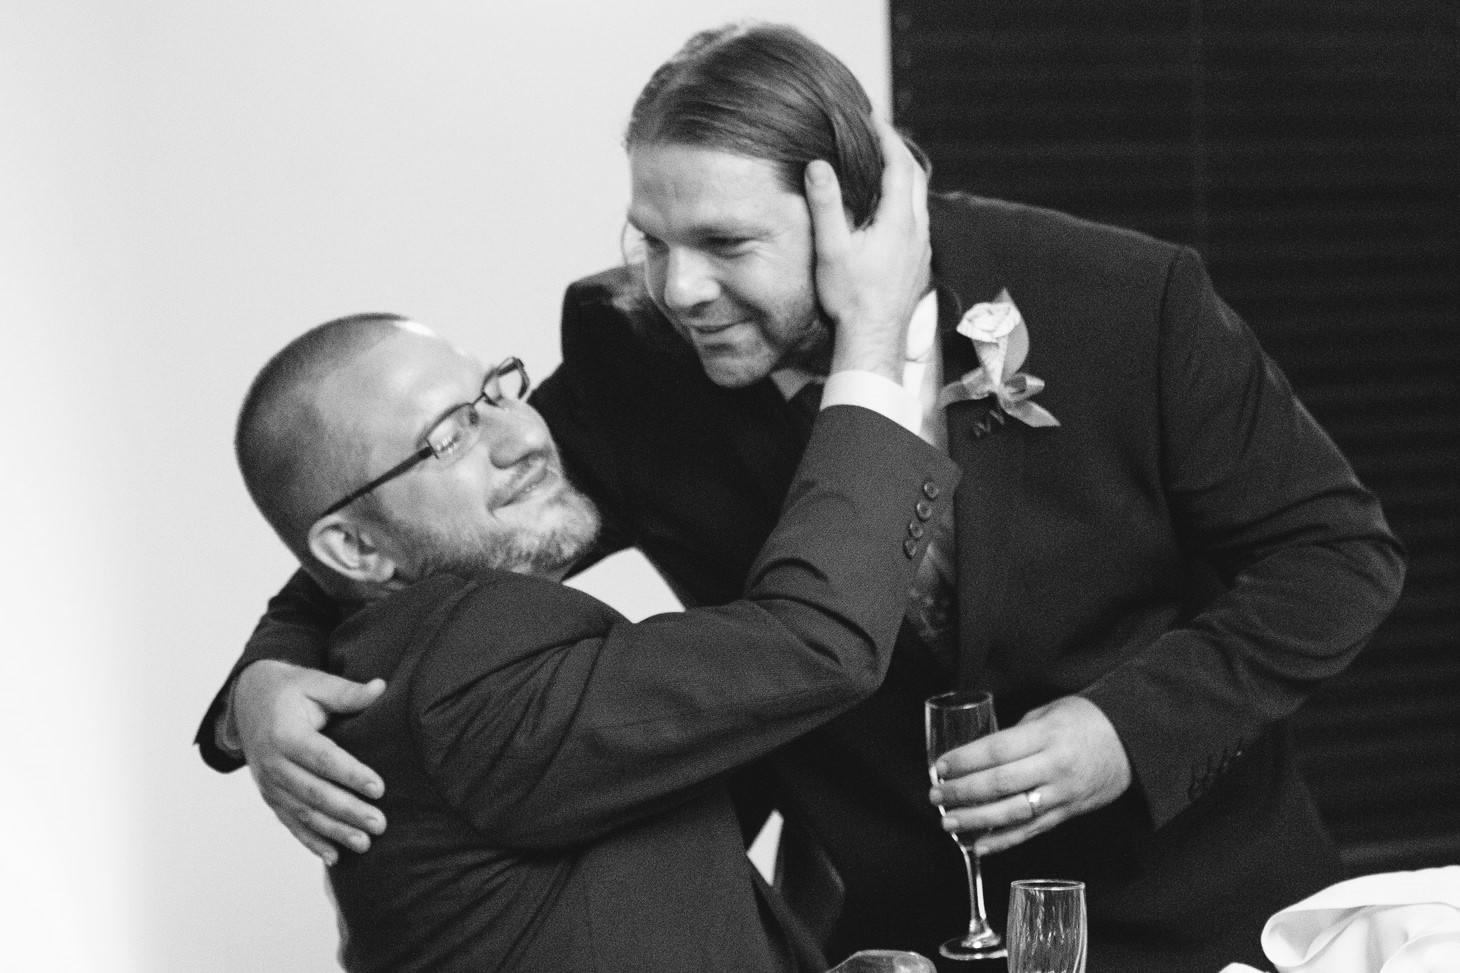 036-nyc-wedding-photographer-nj-nerdy-dr-who-firehouse-wedding-smitten-chickens.jpg